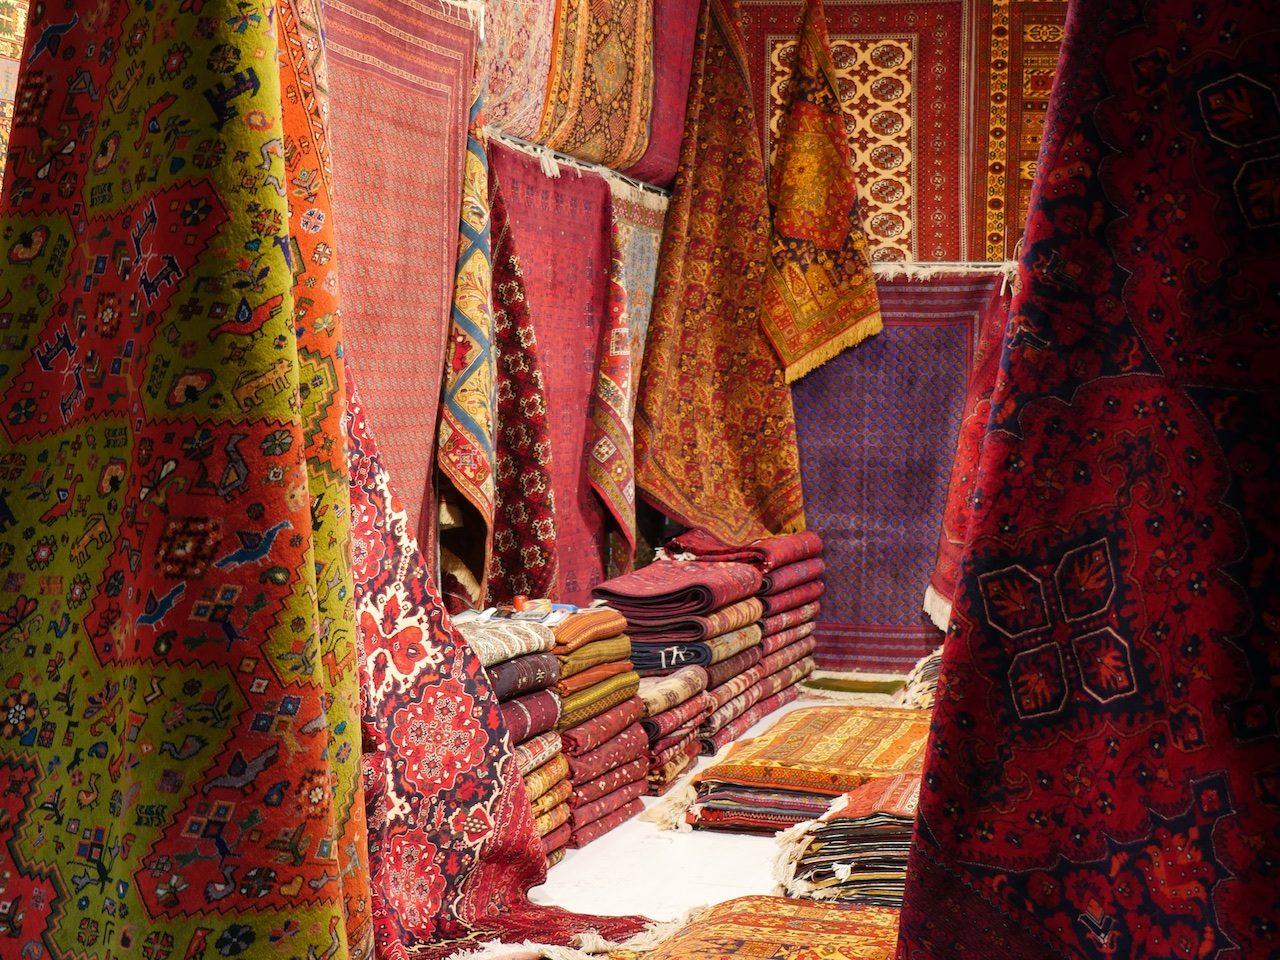 Machine-woven carpets